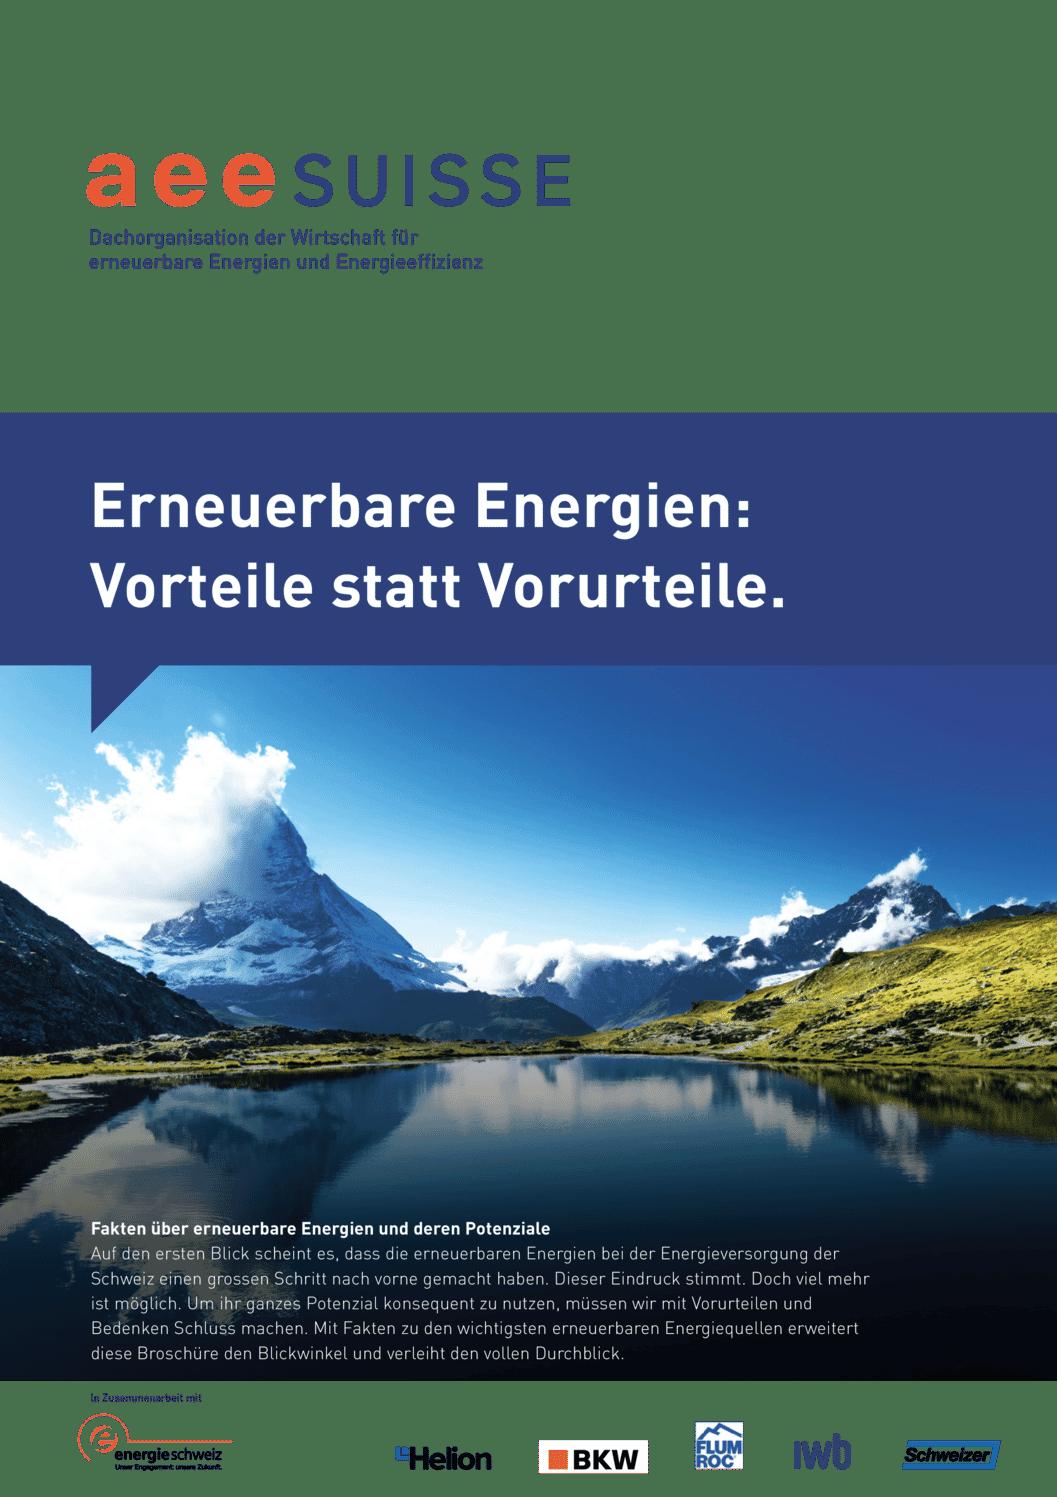 aee suisse Vorteile Erneuerbare Energien